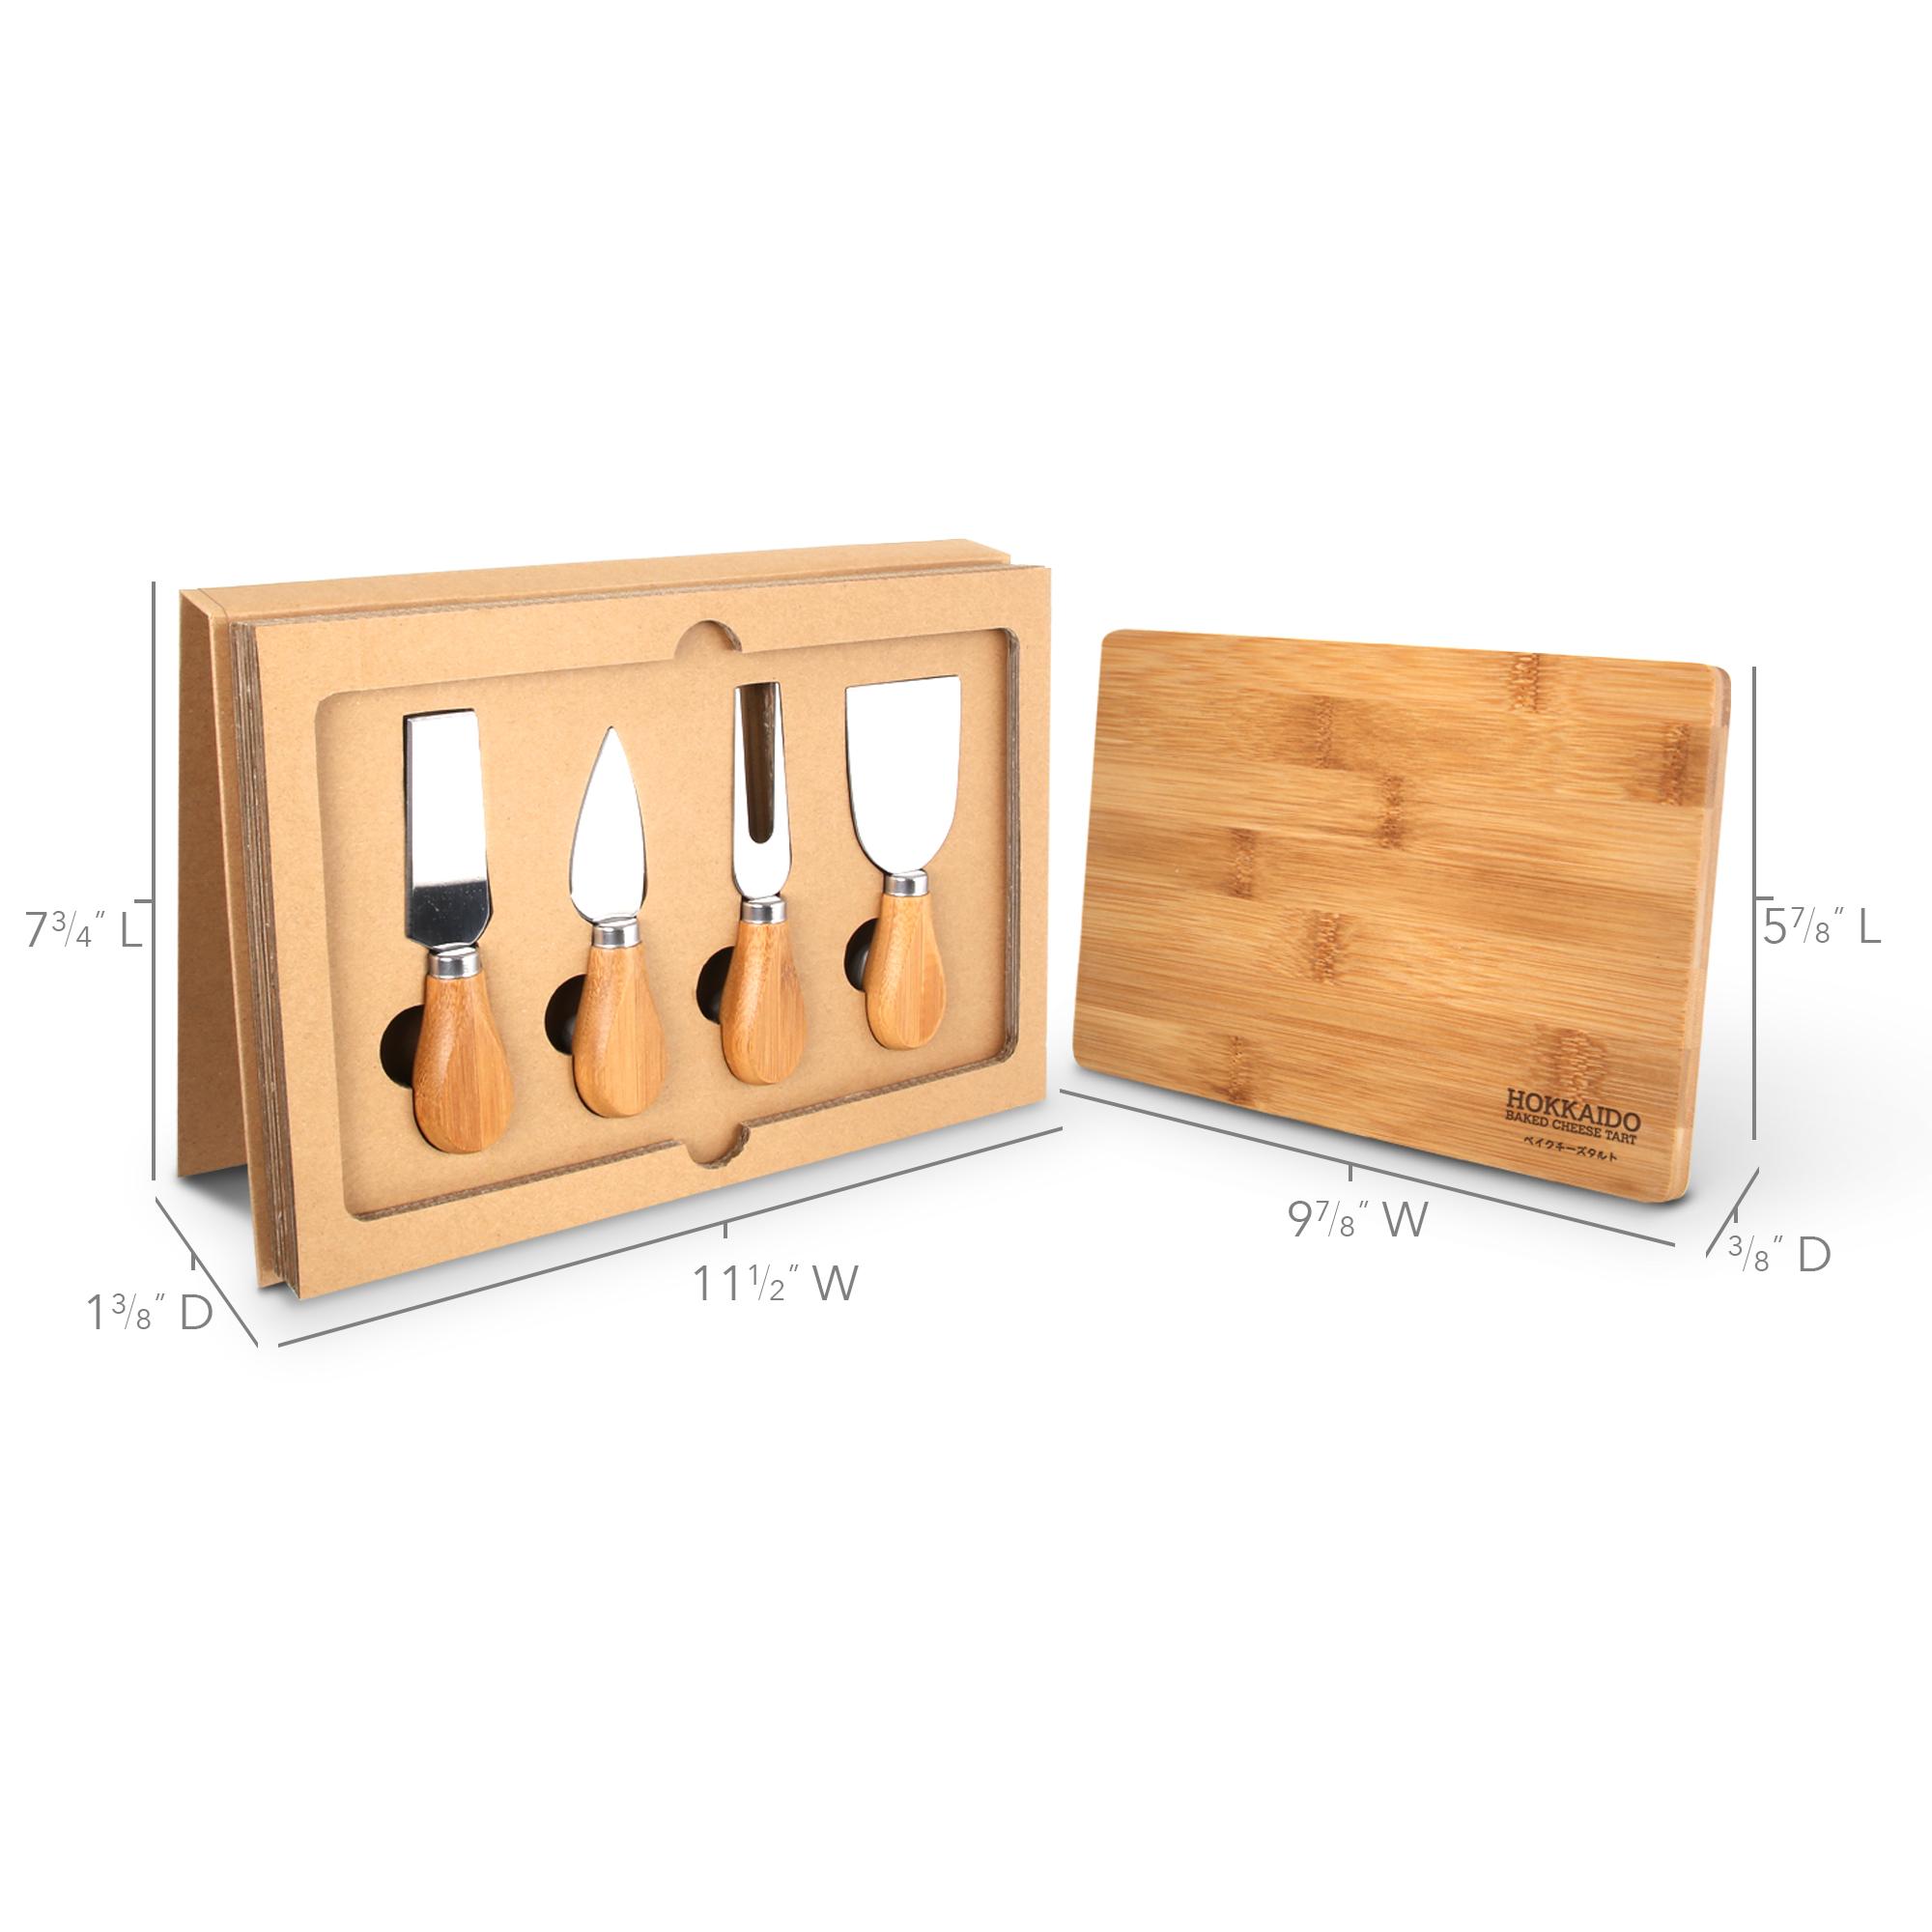 BA-65 5-Piece Cheese Knife Set & Bamboo Cutting Board w/ Gift Box